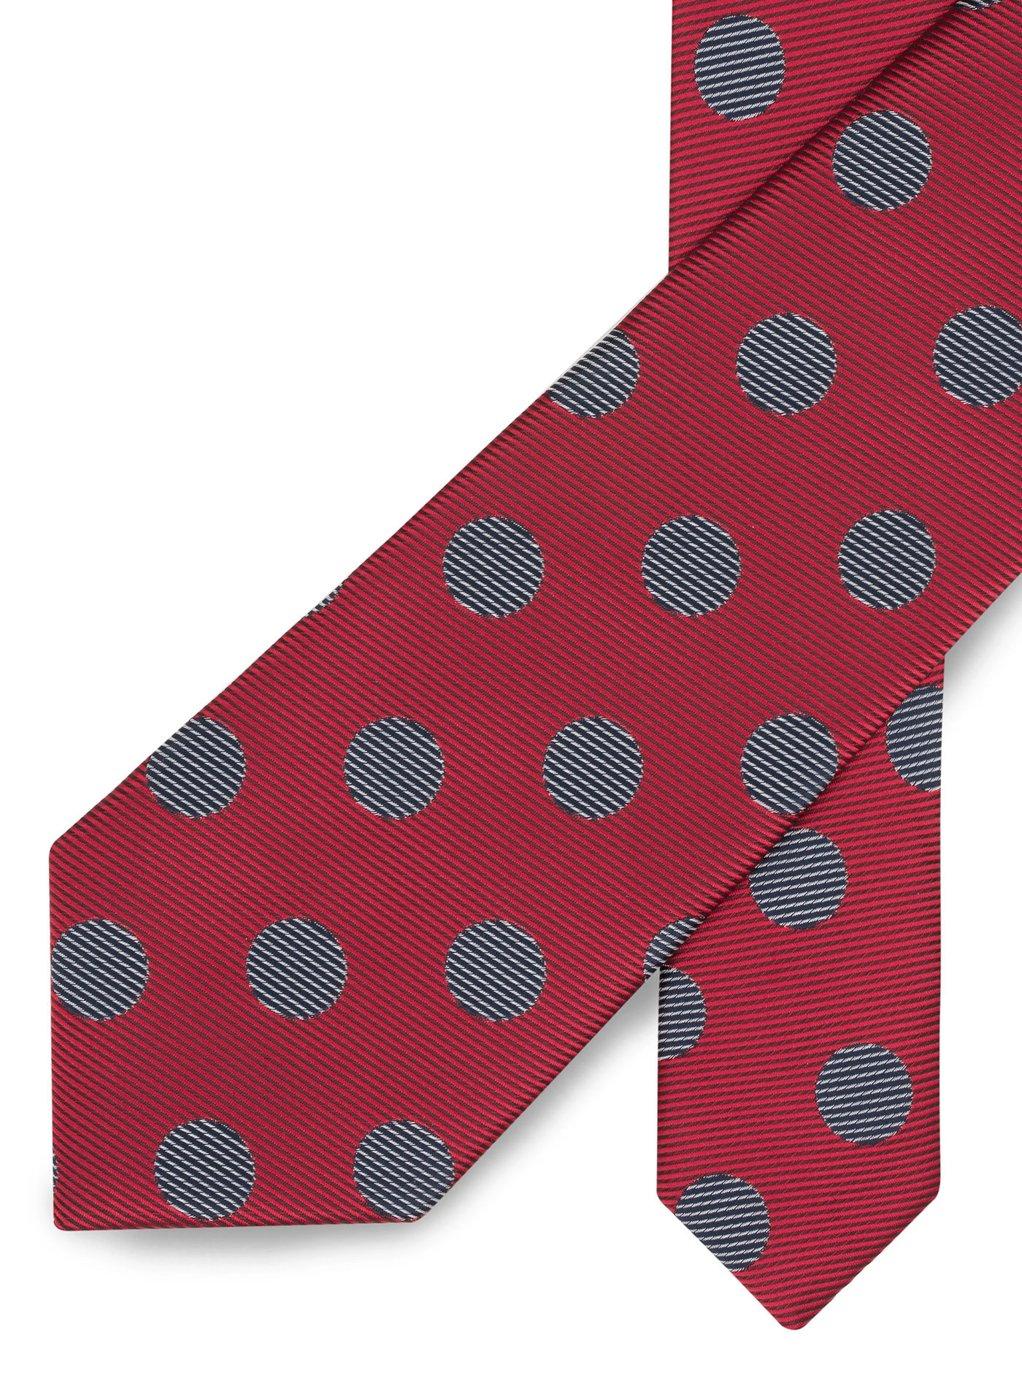 Krawat męski PLM-KX-318-W